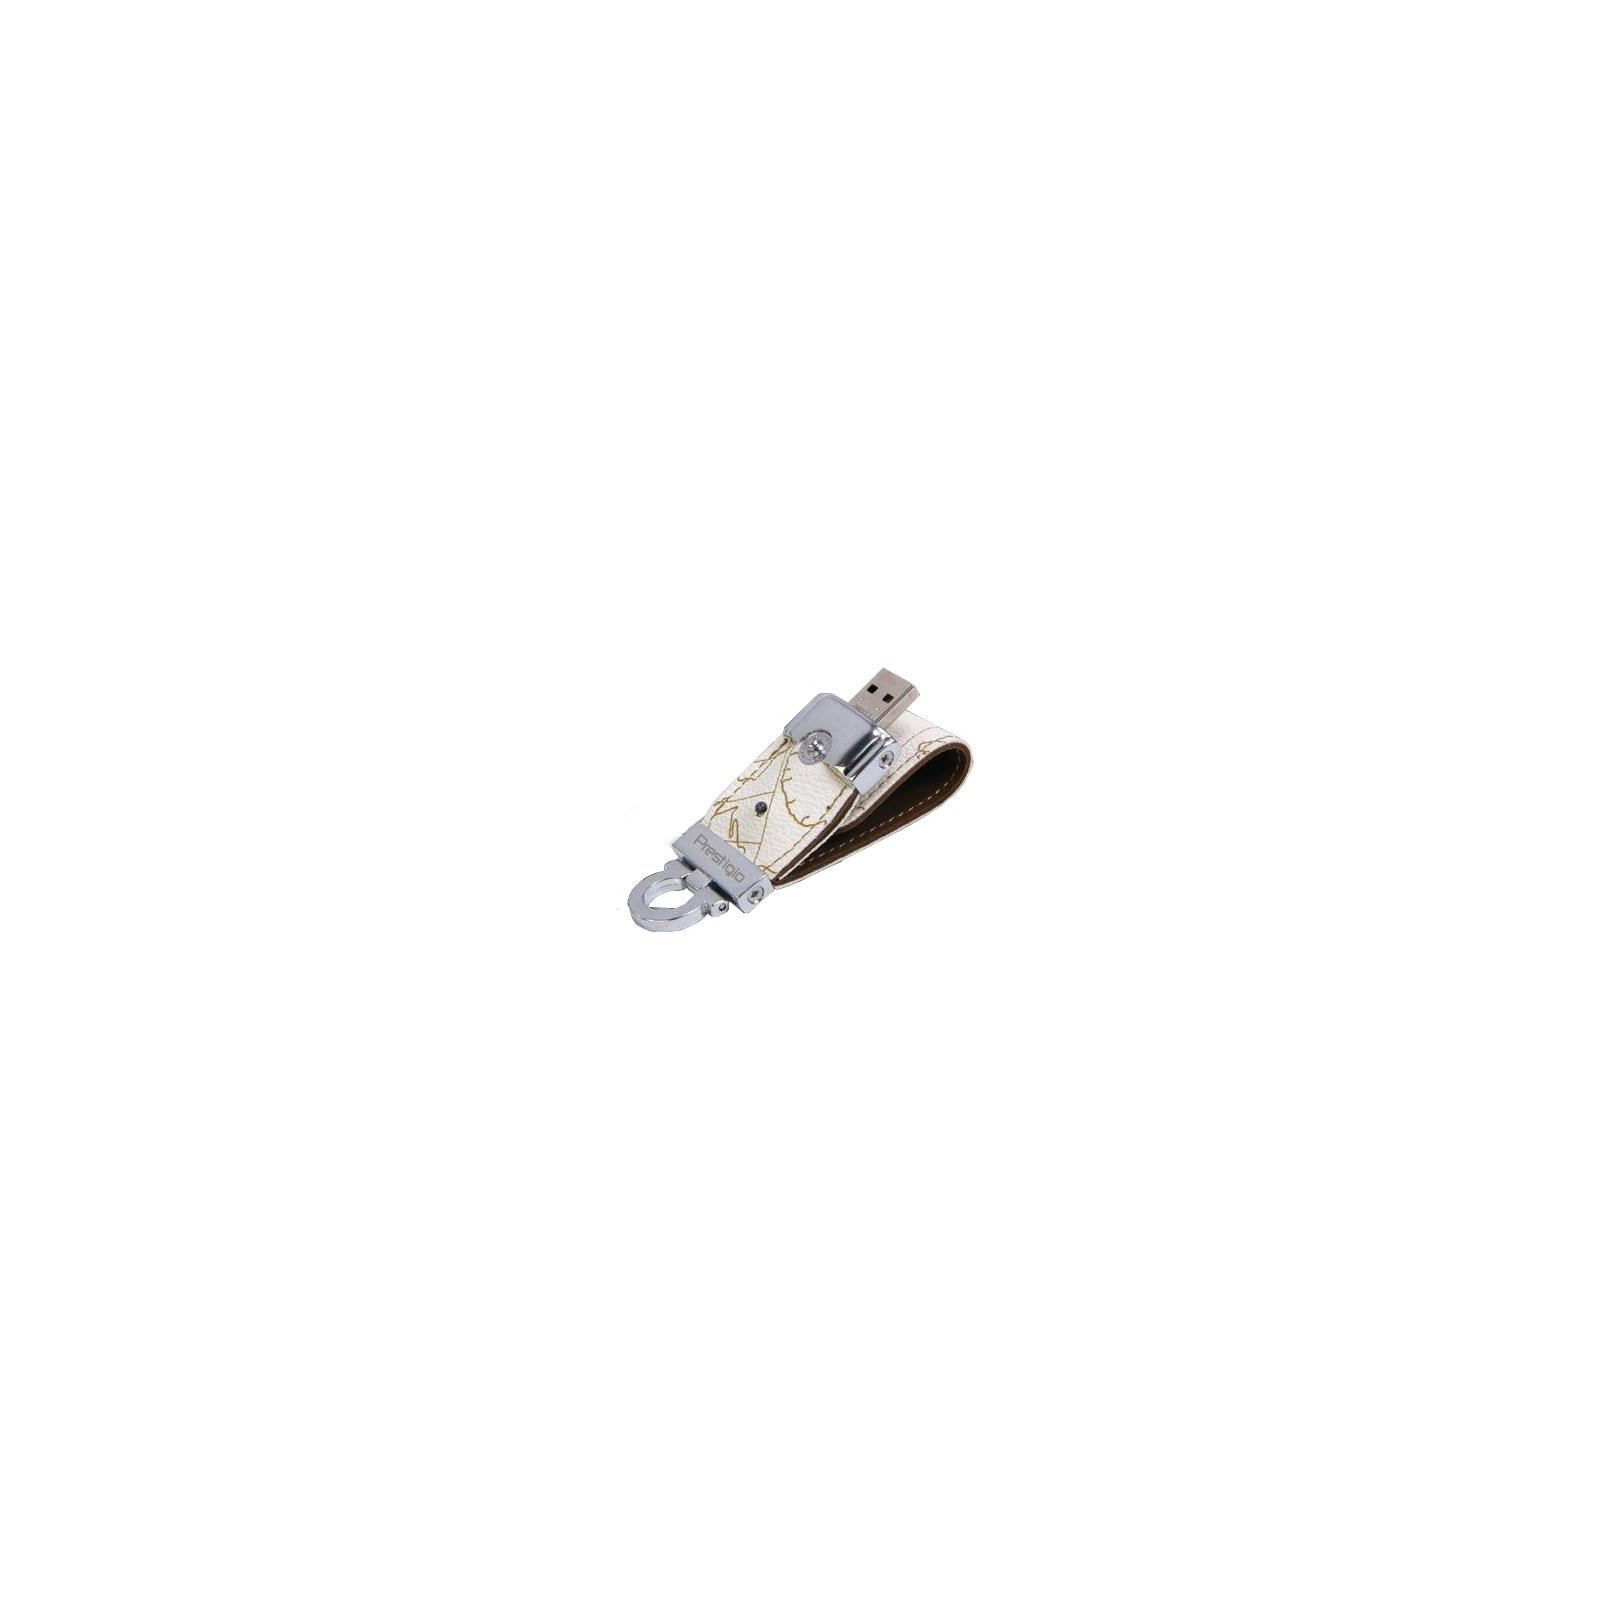 USB флеш накопитель 16Gb Leather Flash White PRESTIGIO (PLDF16MPWHA)